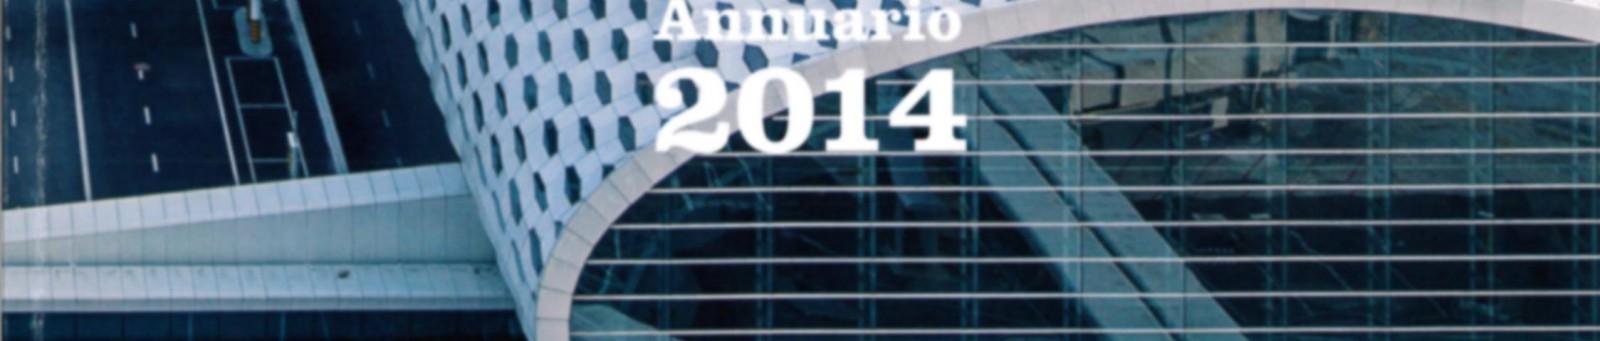 CaseArchitetture Annuario 2014